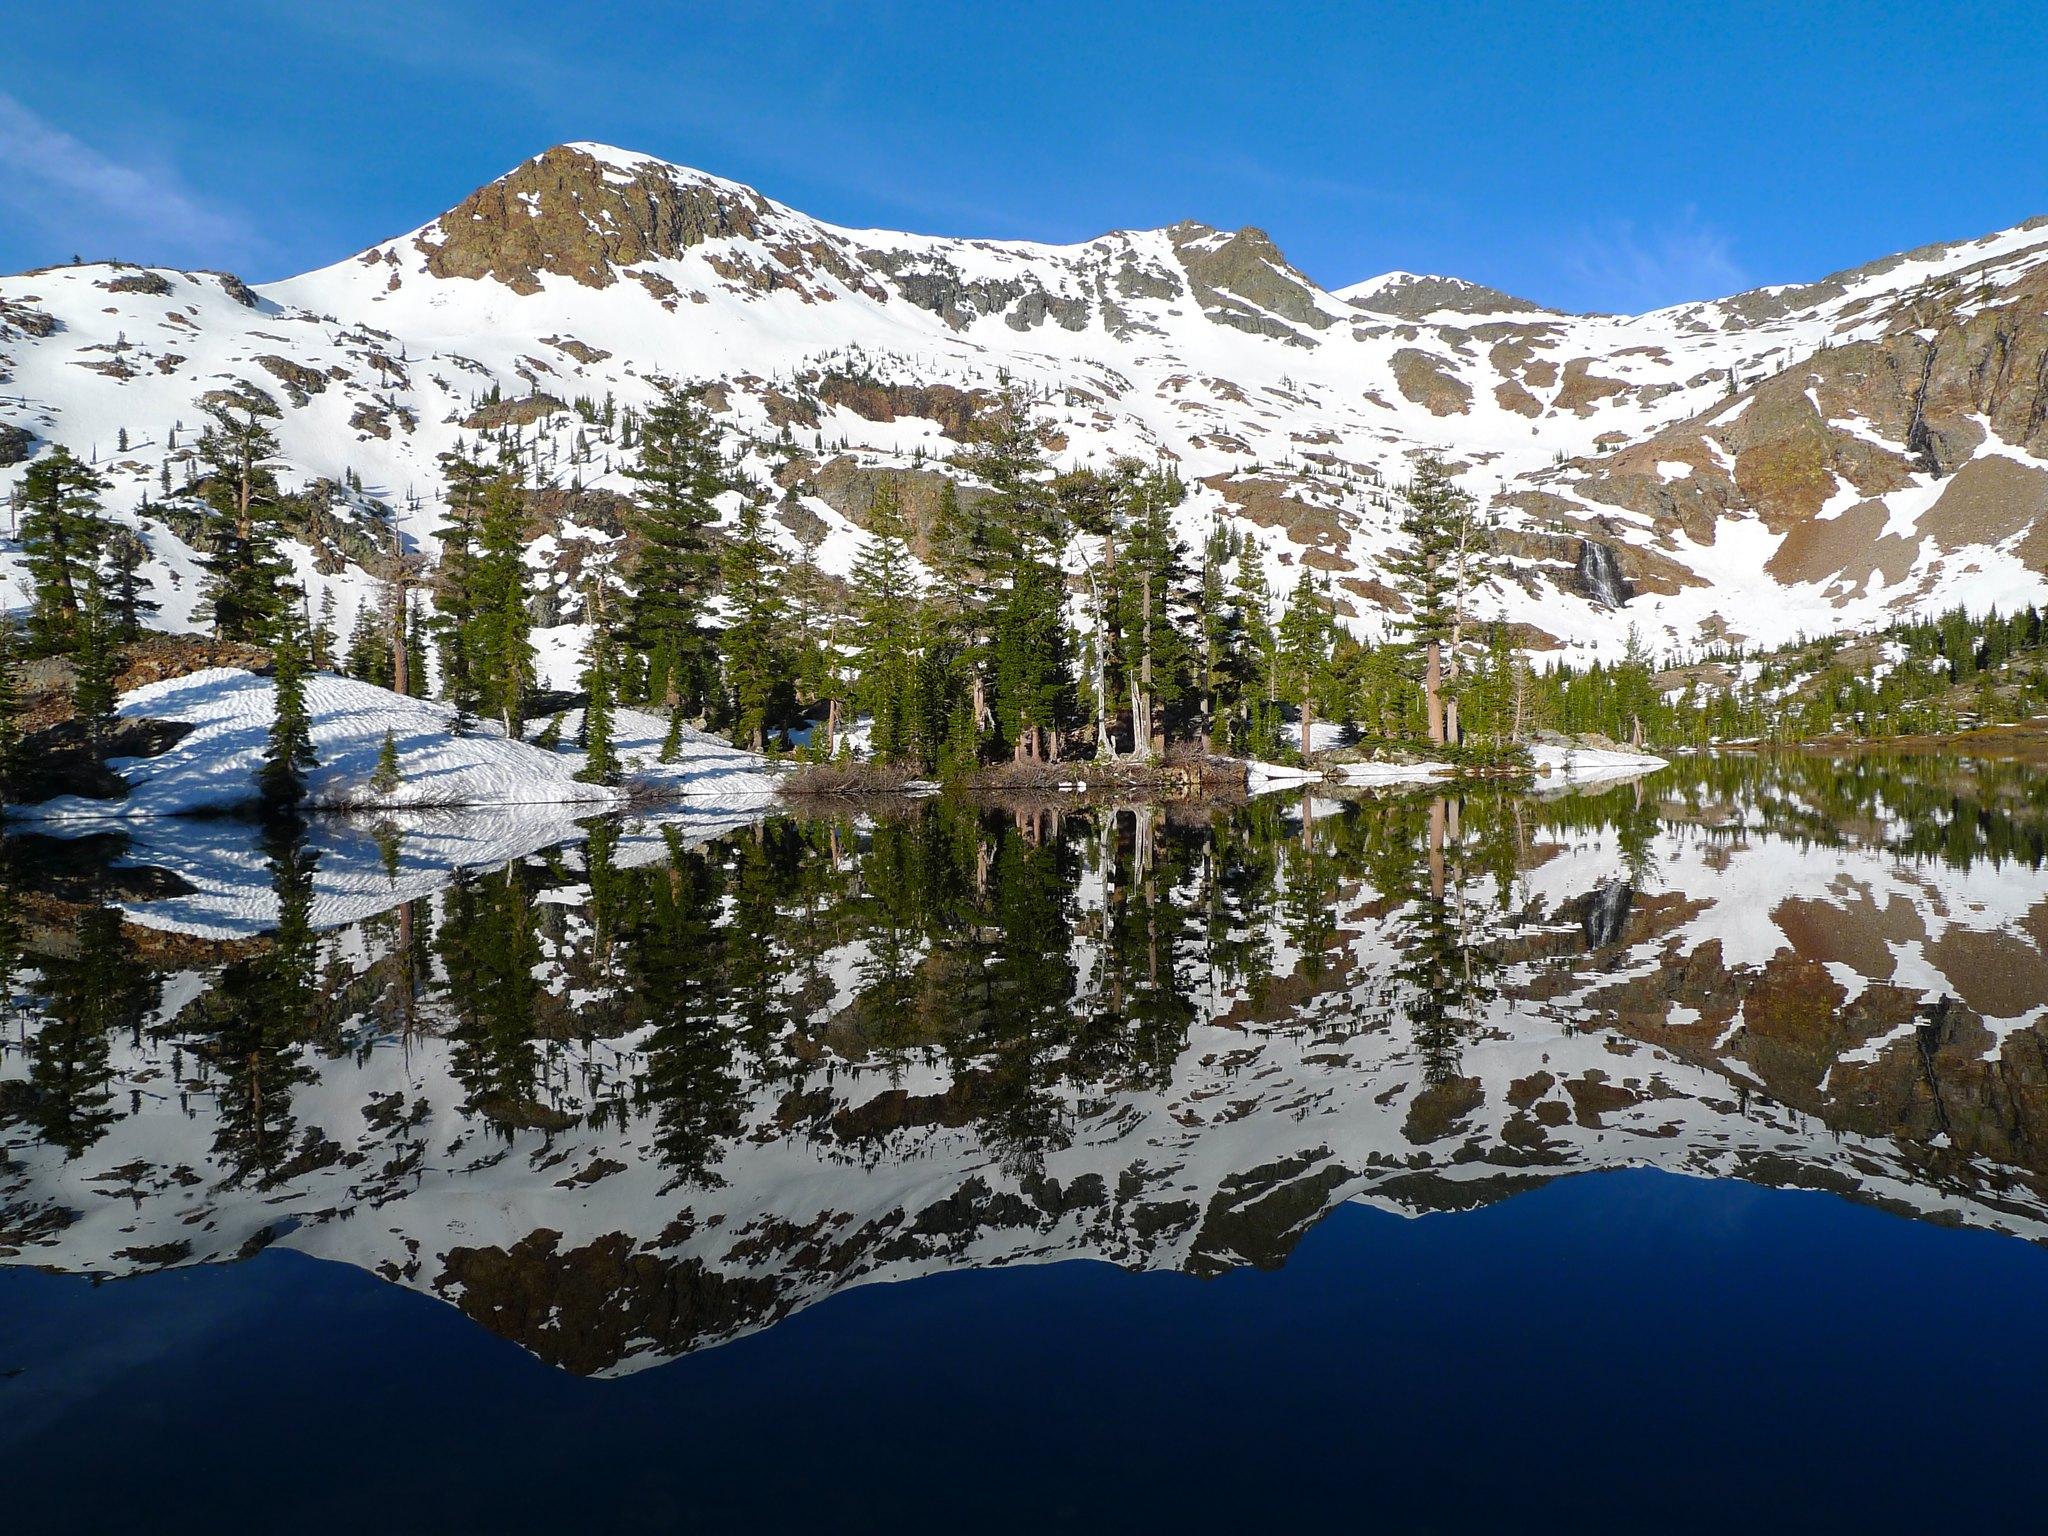 Half Moon Lake in the morning